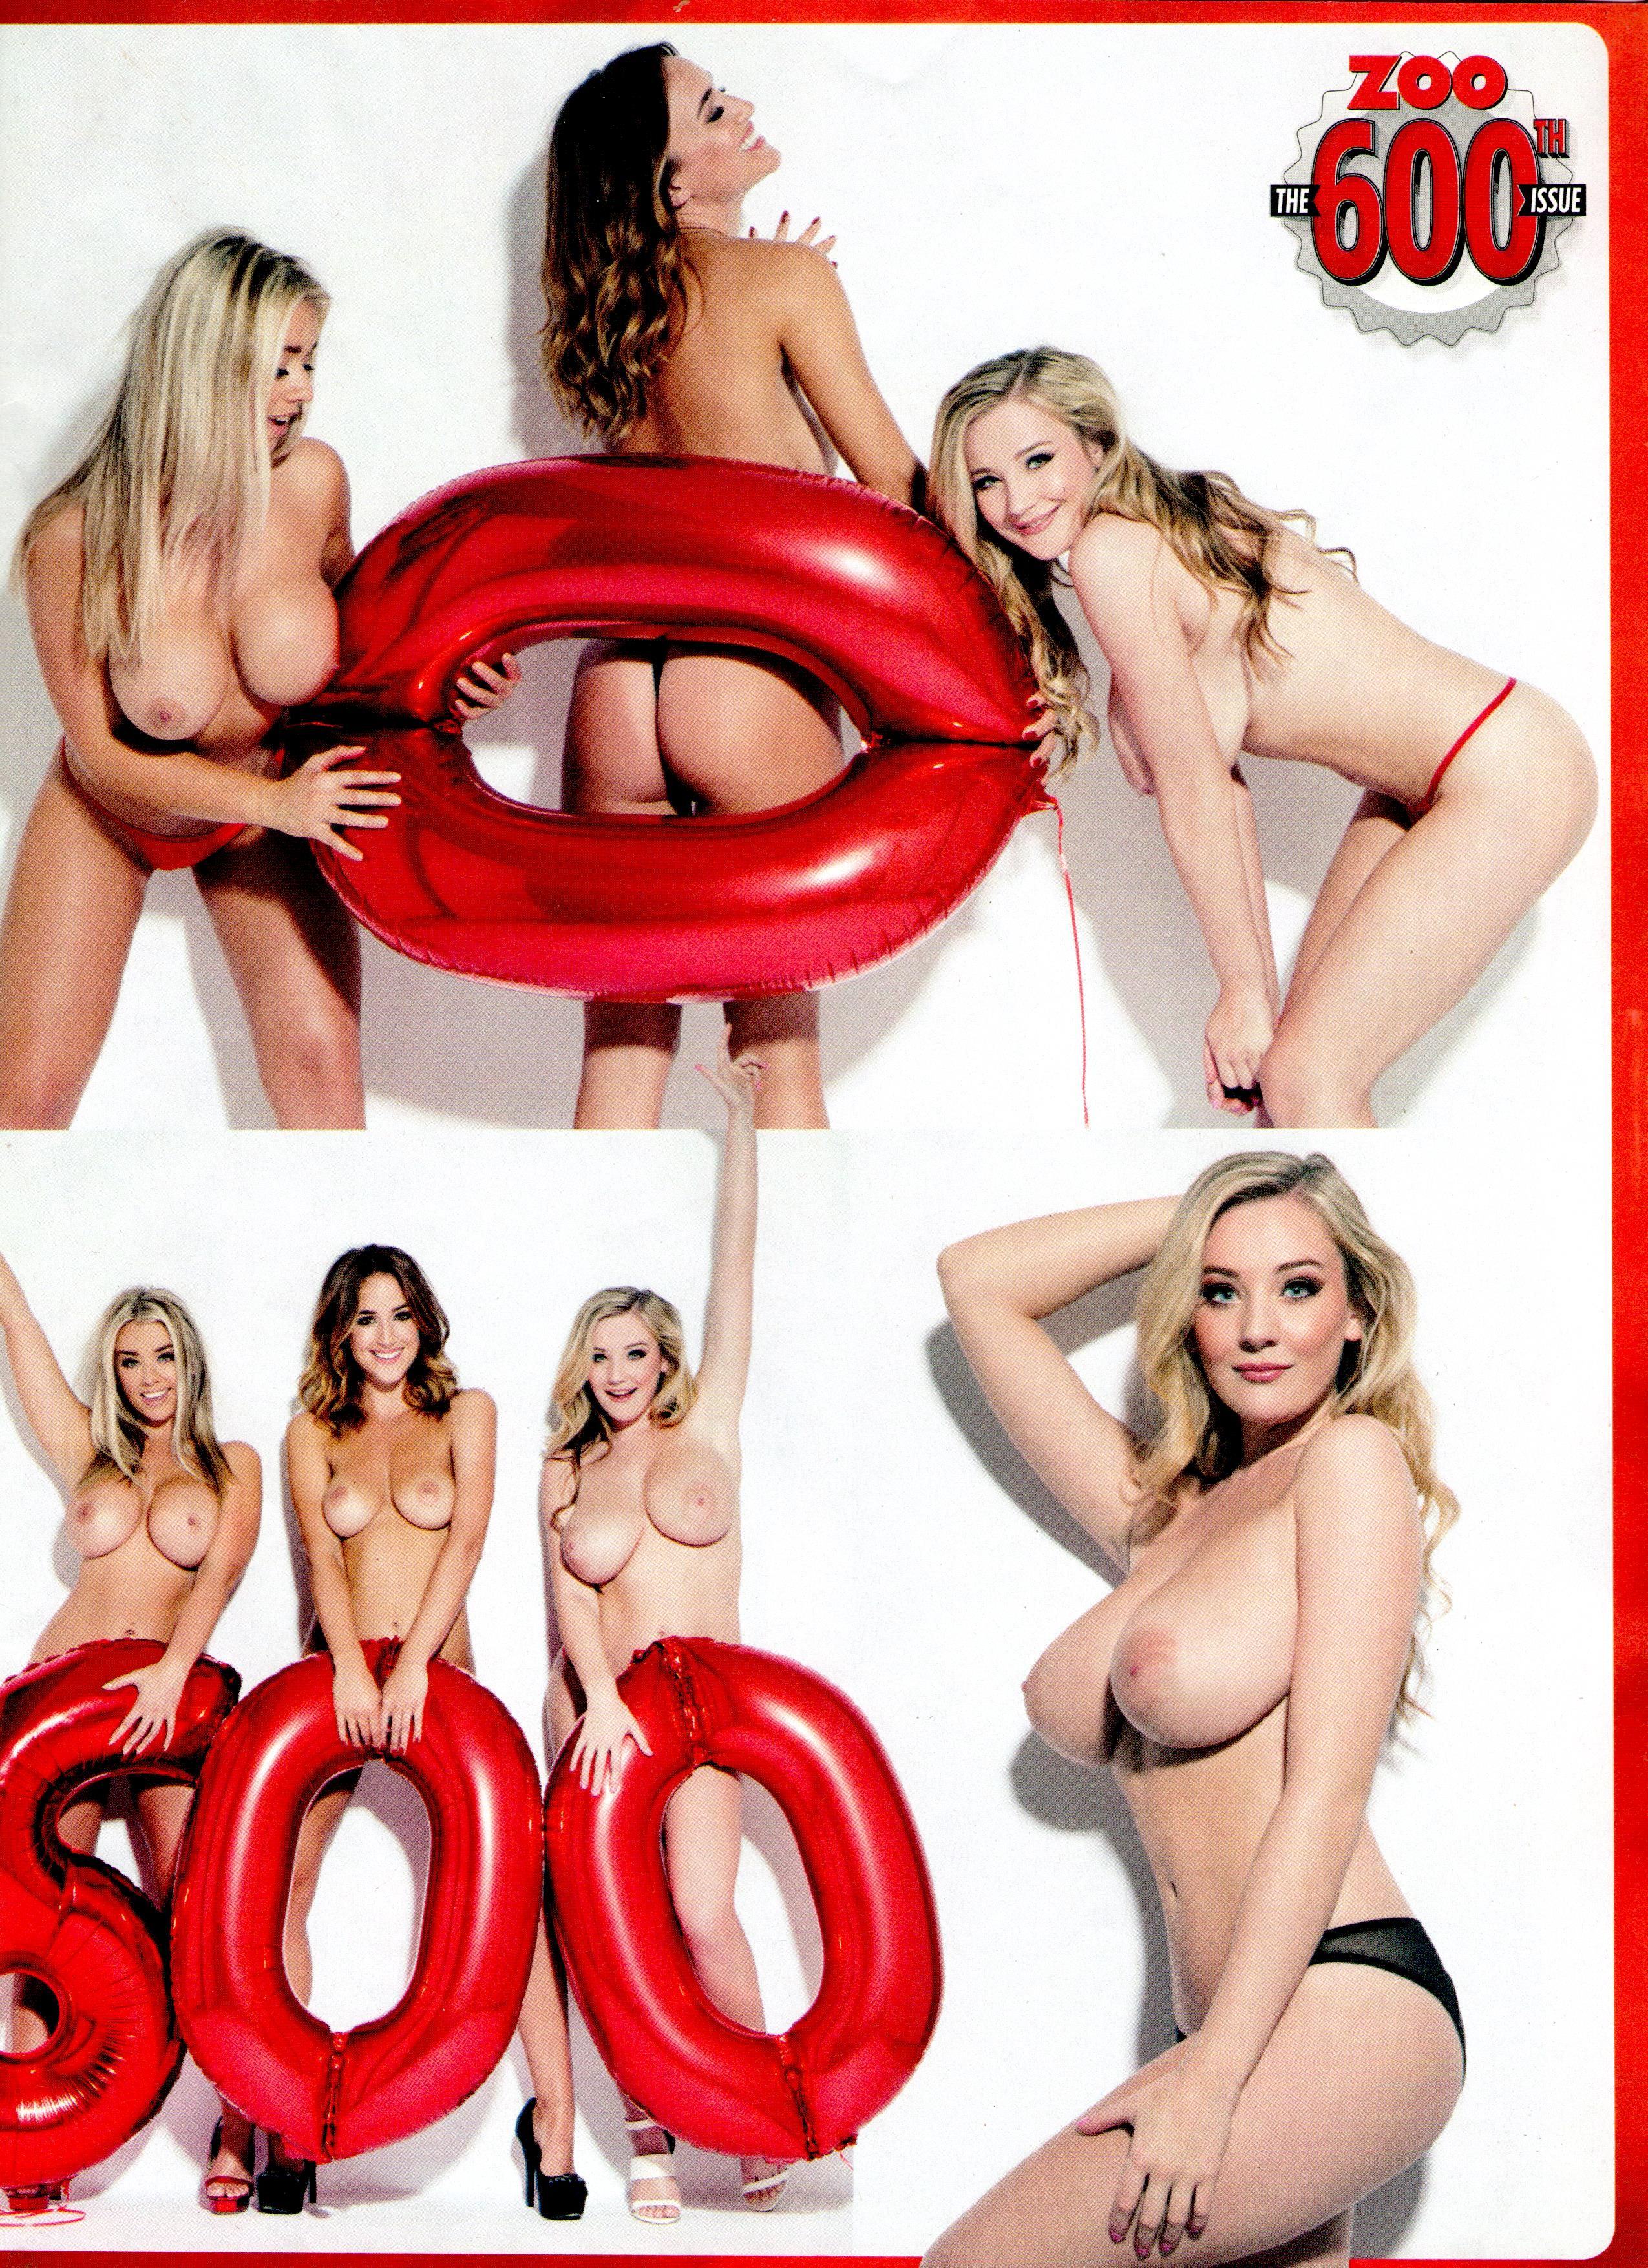 Rosie-Jones-Melissa-Debling-Bethany-Lily-Topless-6